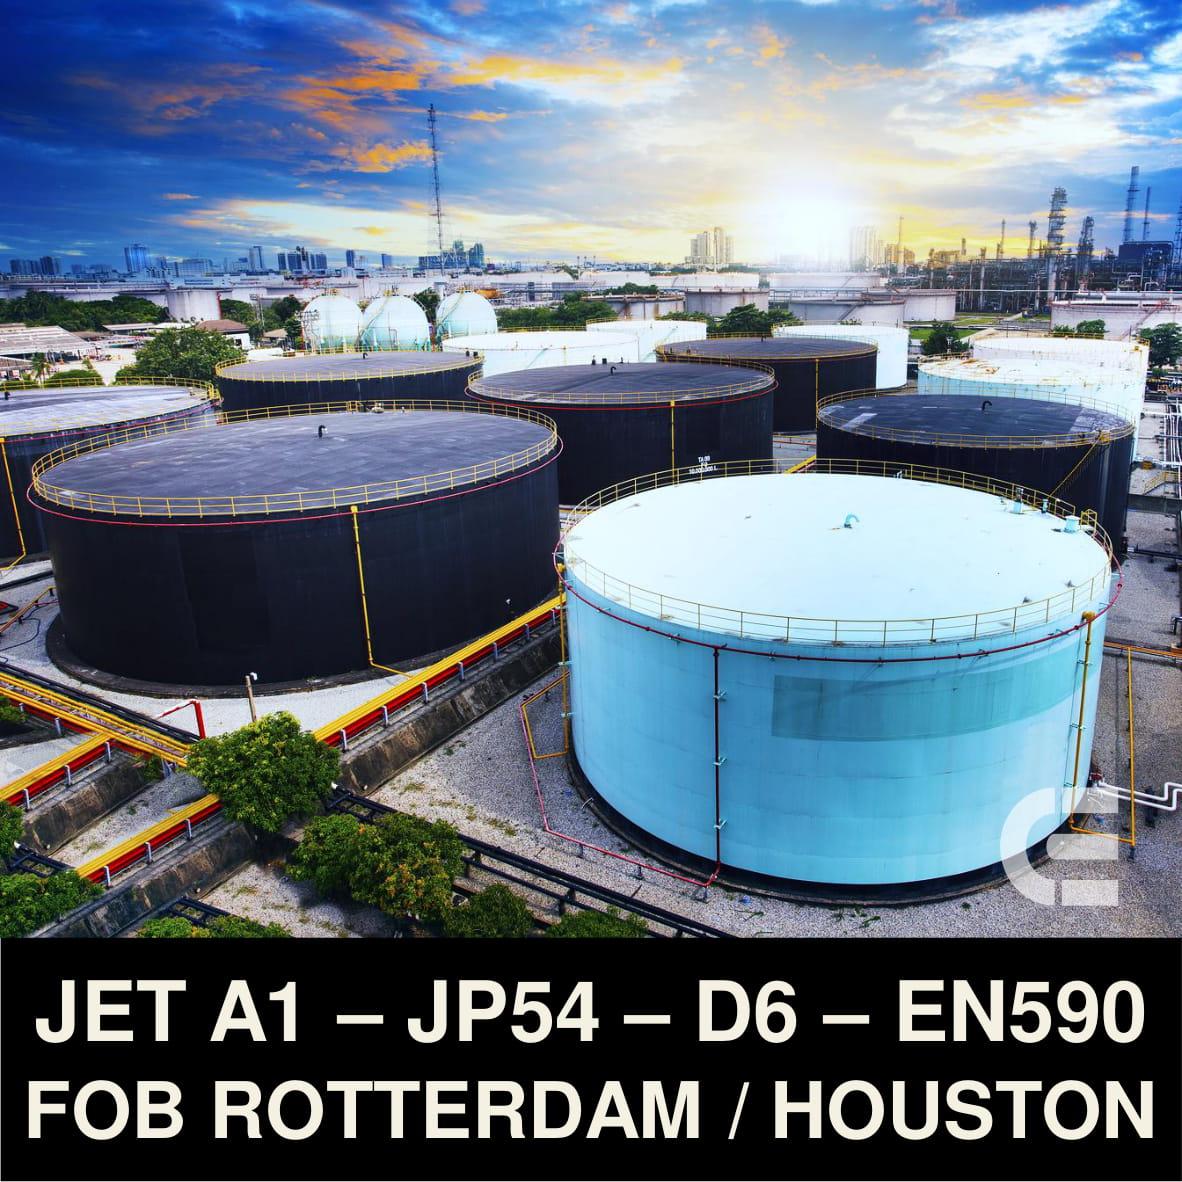 Jet A1 Fuel - JP54 - Virgin Oil D6 - EN590 FOB Rotterdam and Houston